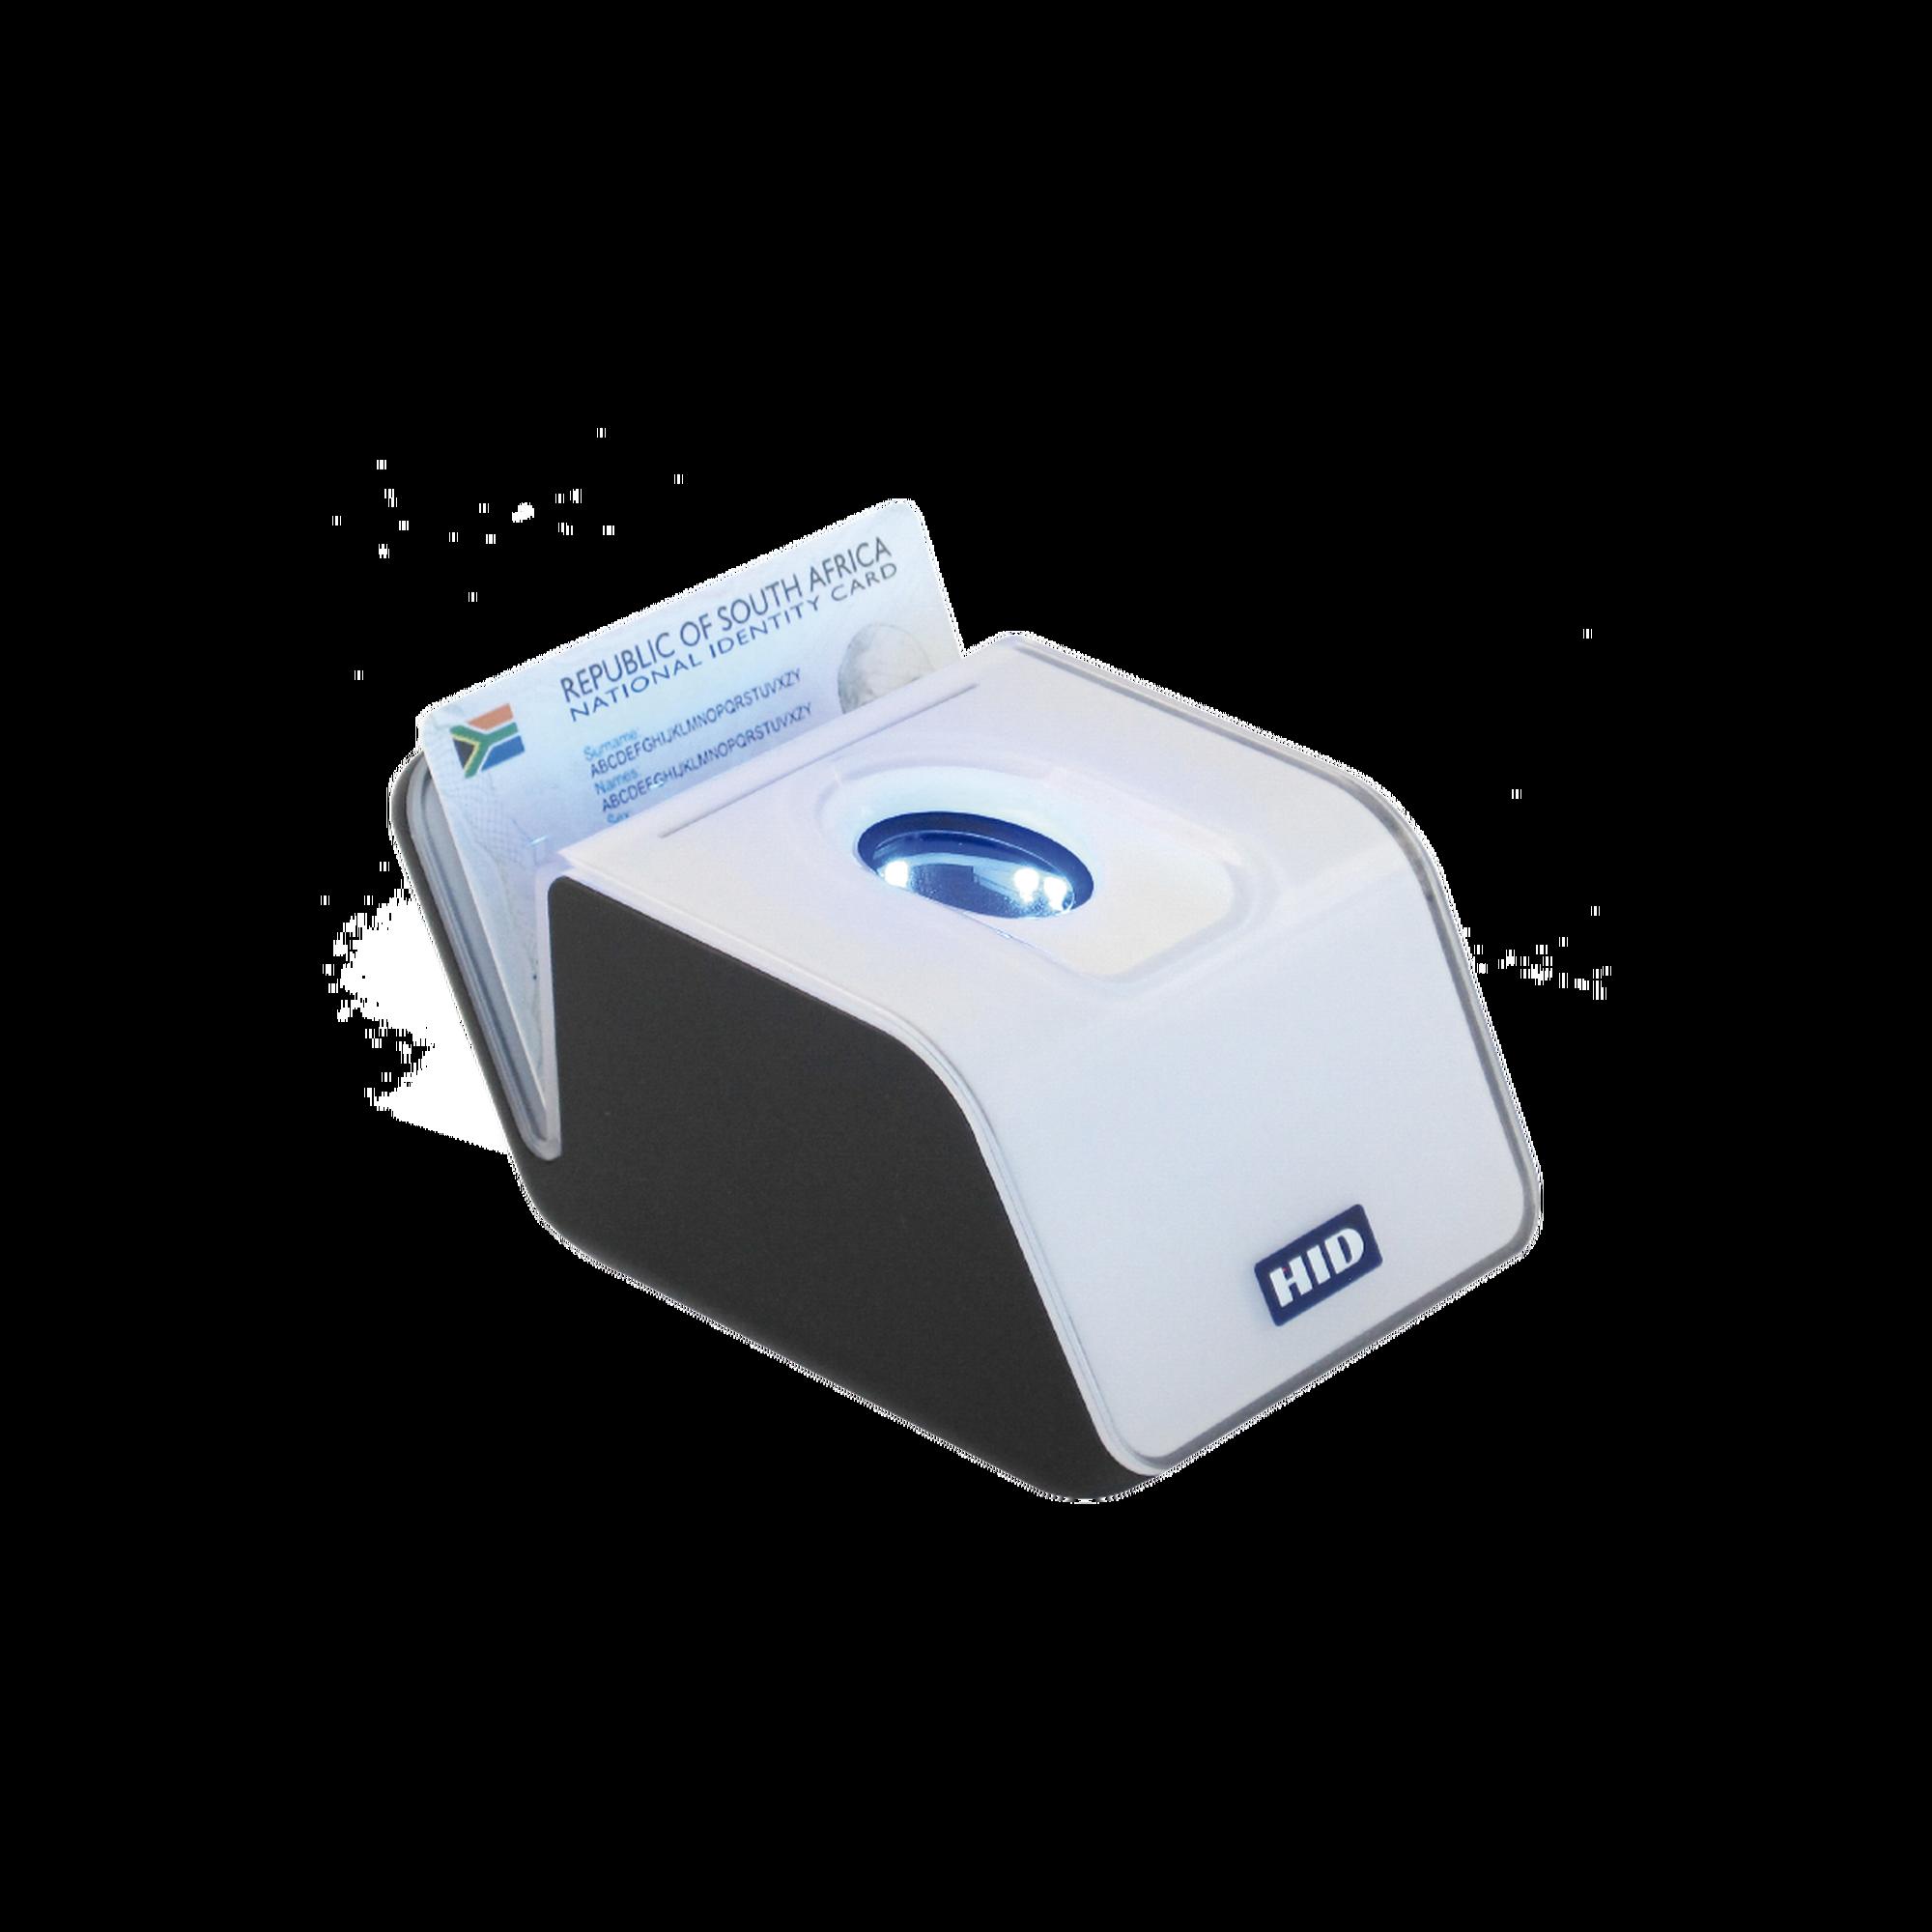 Lumidigm V-Series V371 Lectora de huella digital/ Multiespectral + iClass /Doble Verificación